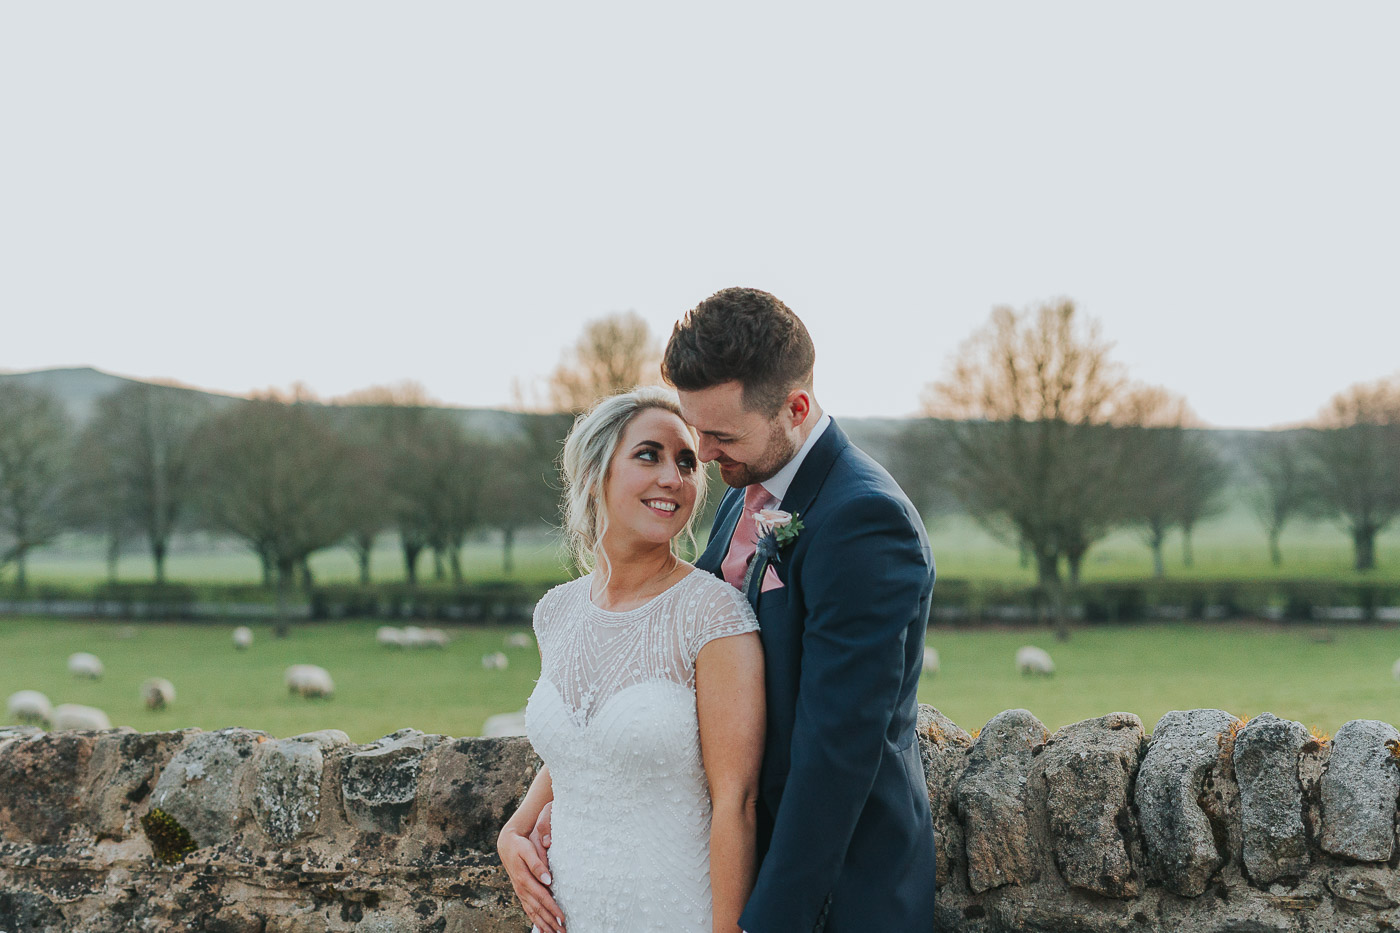 Tithe Barn - Laura Calderwood Photography - 29.3.19 - Mr & Mrs Lancaster290319-178.jpg